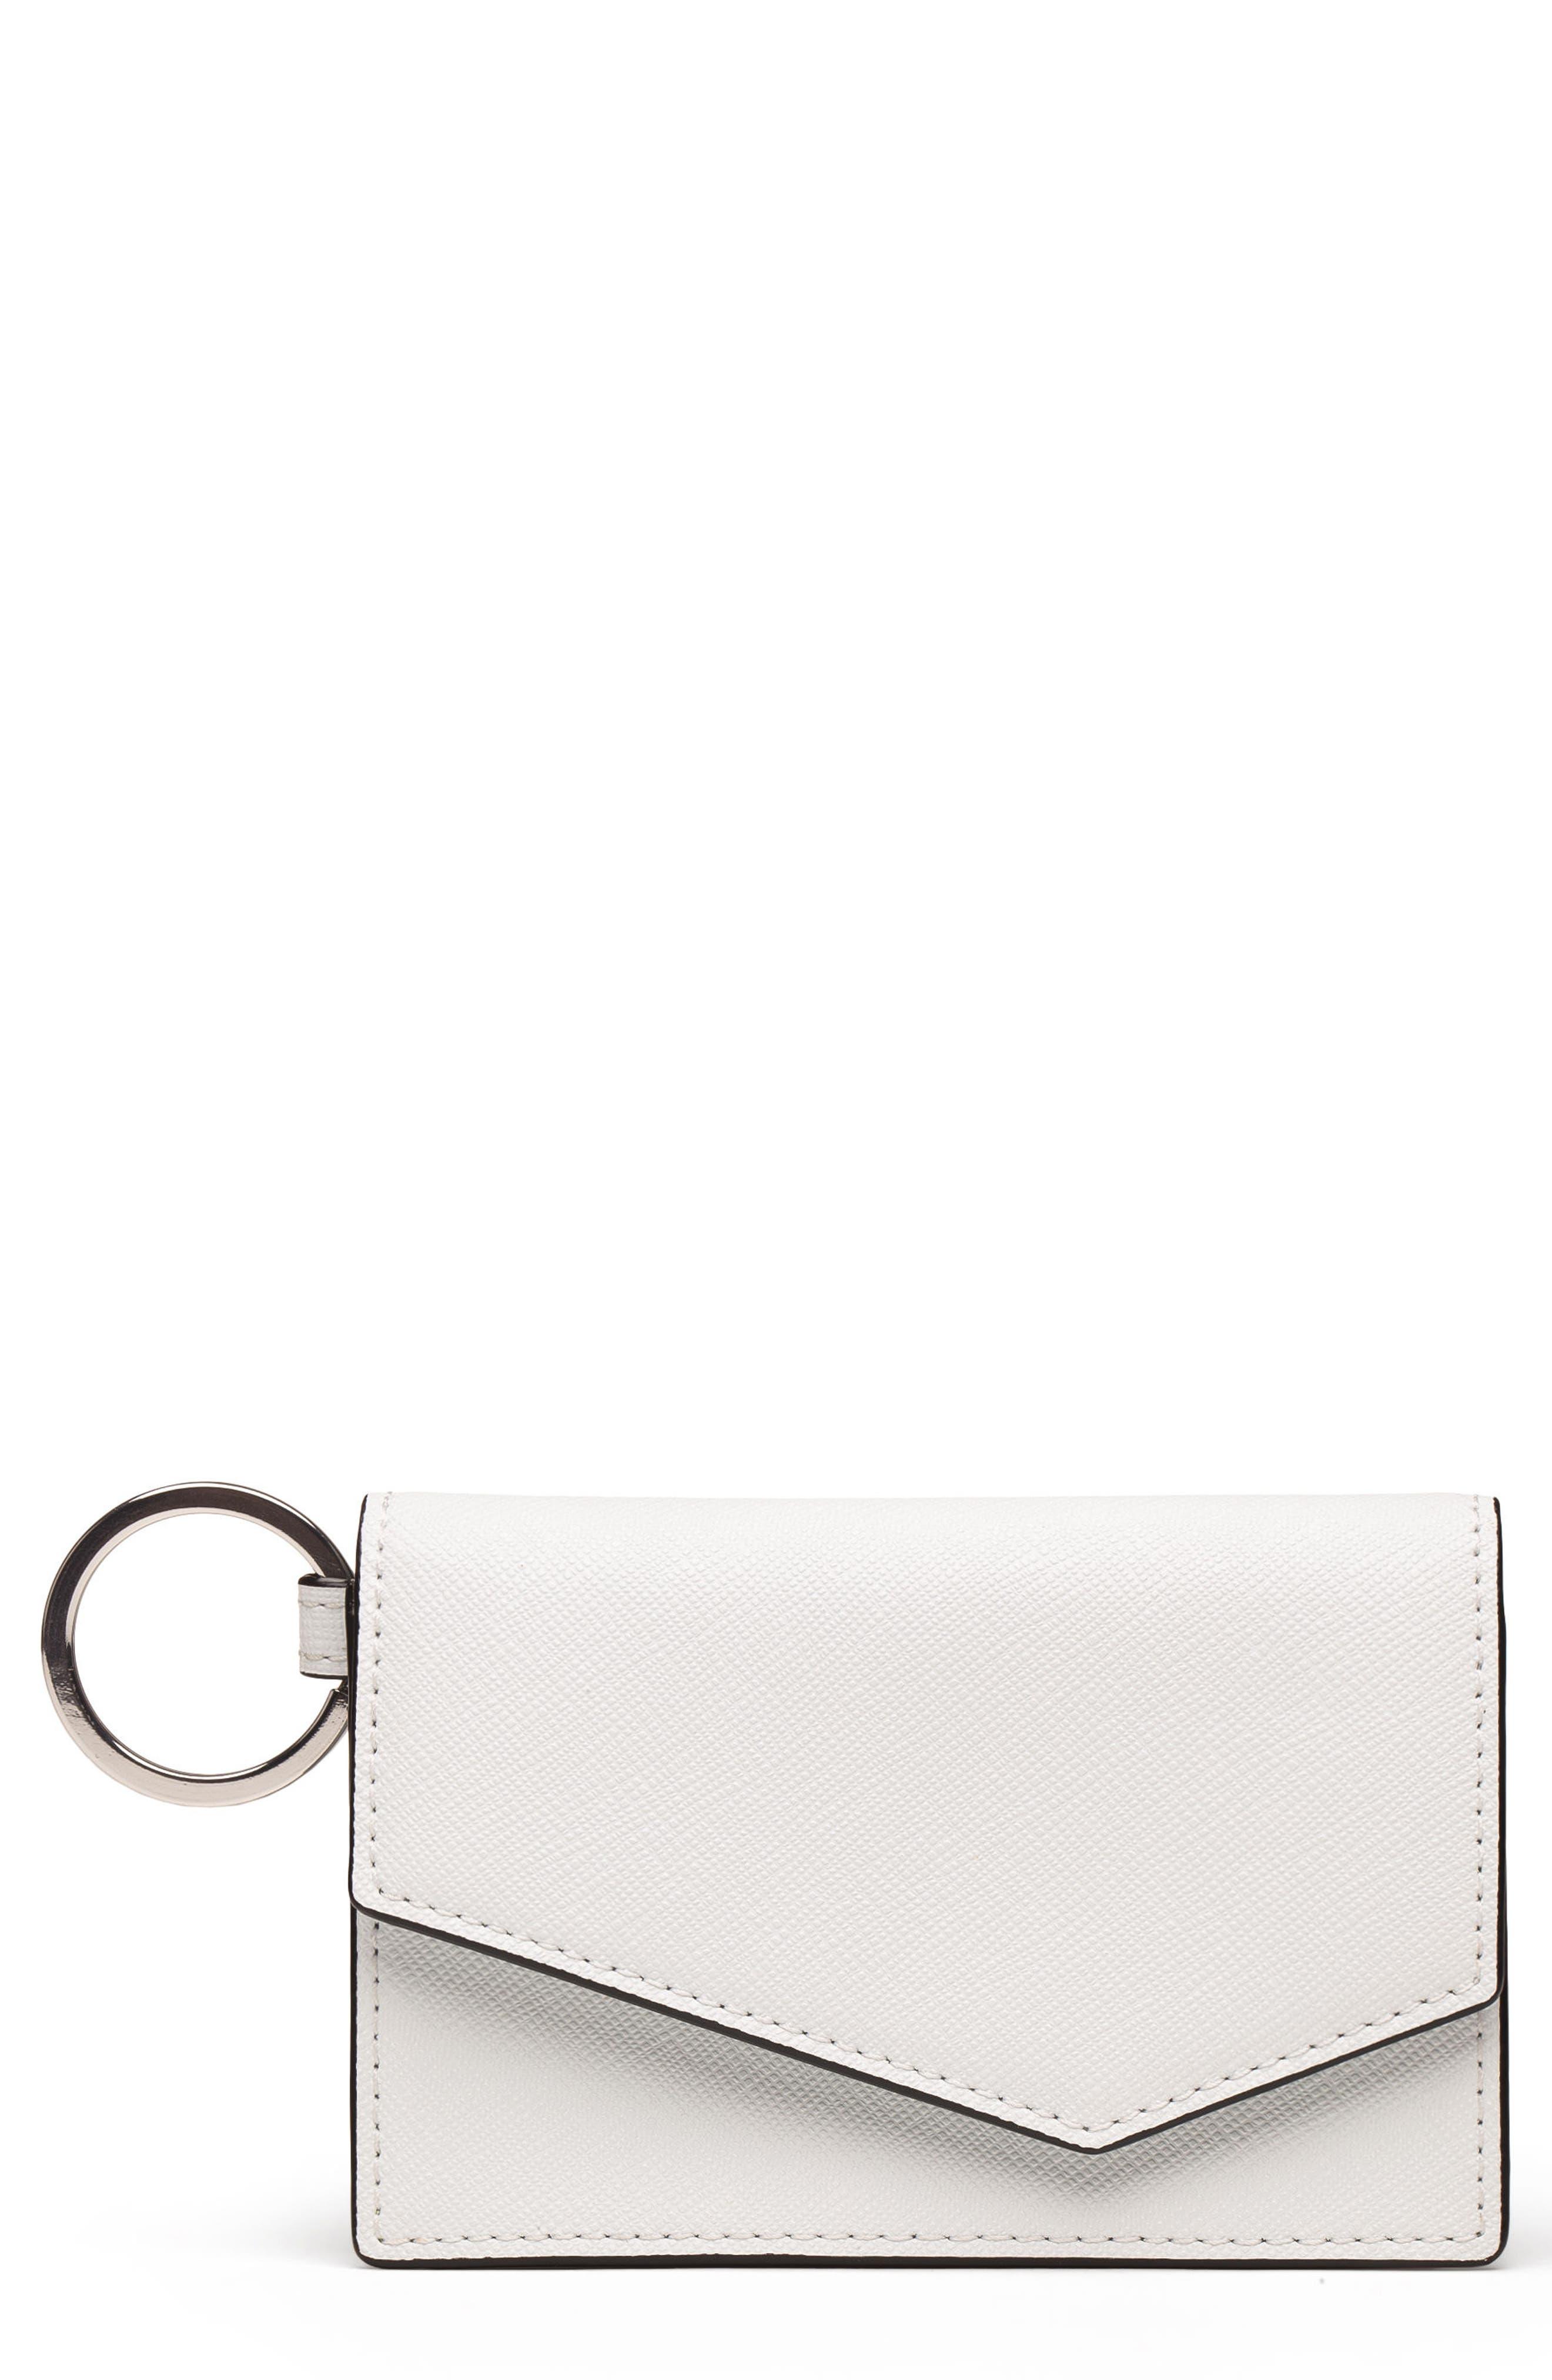 Cobble Hill Saffiano Leather Card Case,                             Main thumbnail 1, color,                             CHALK